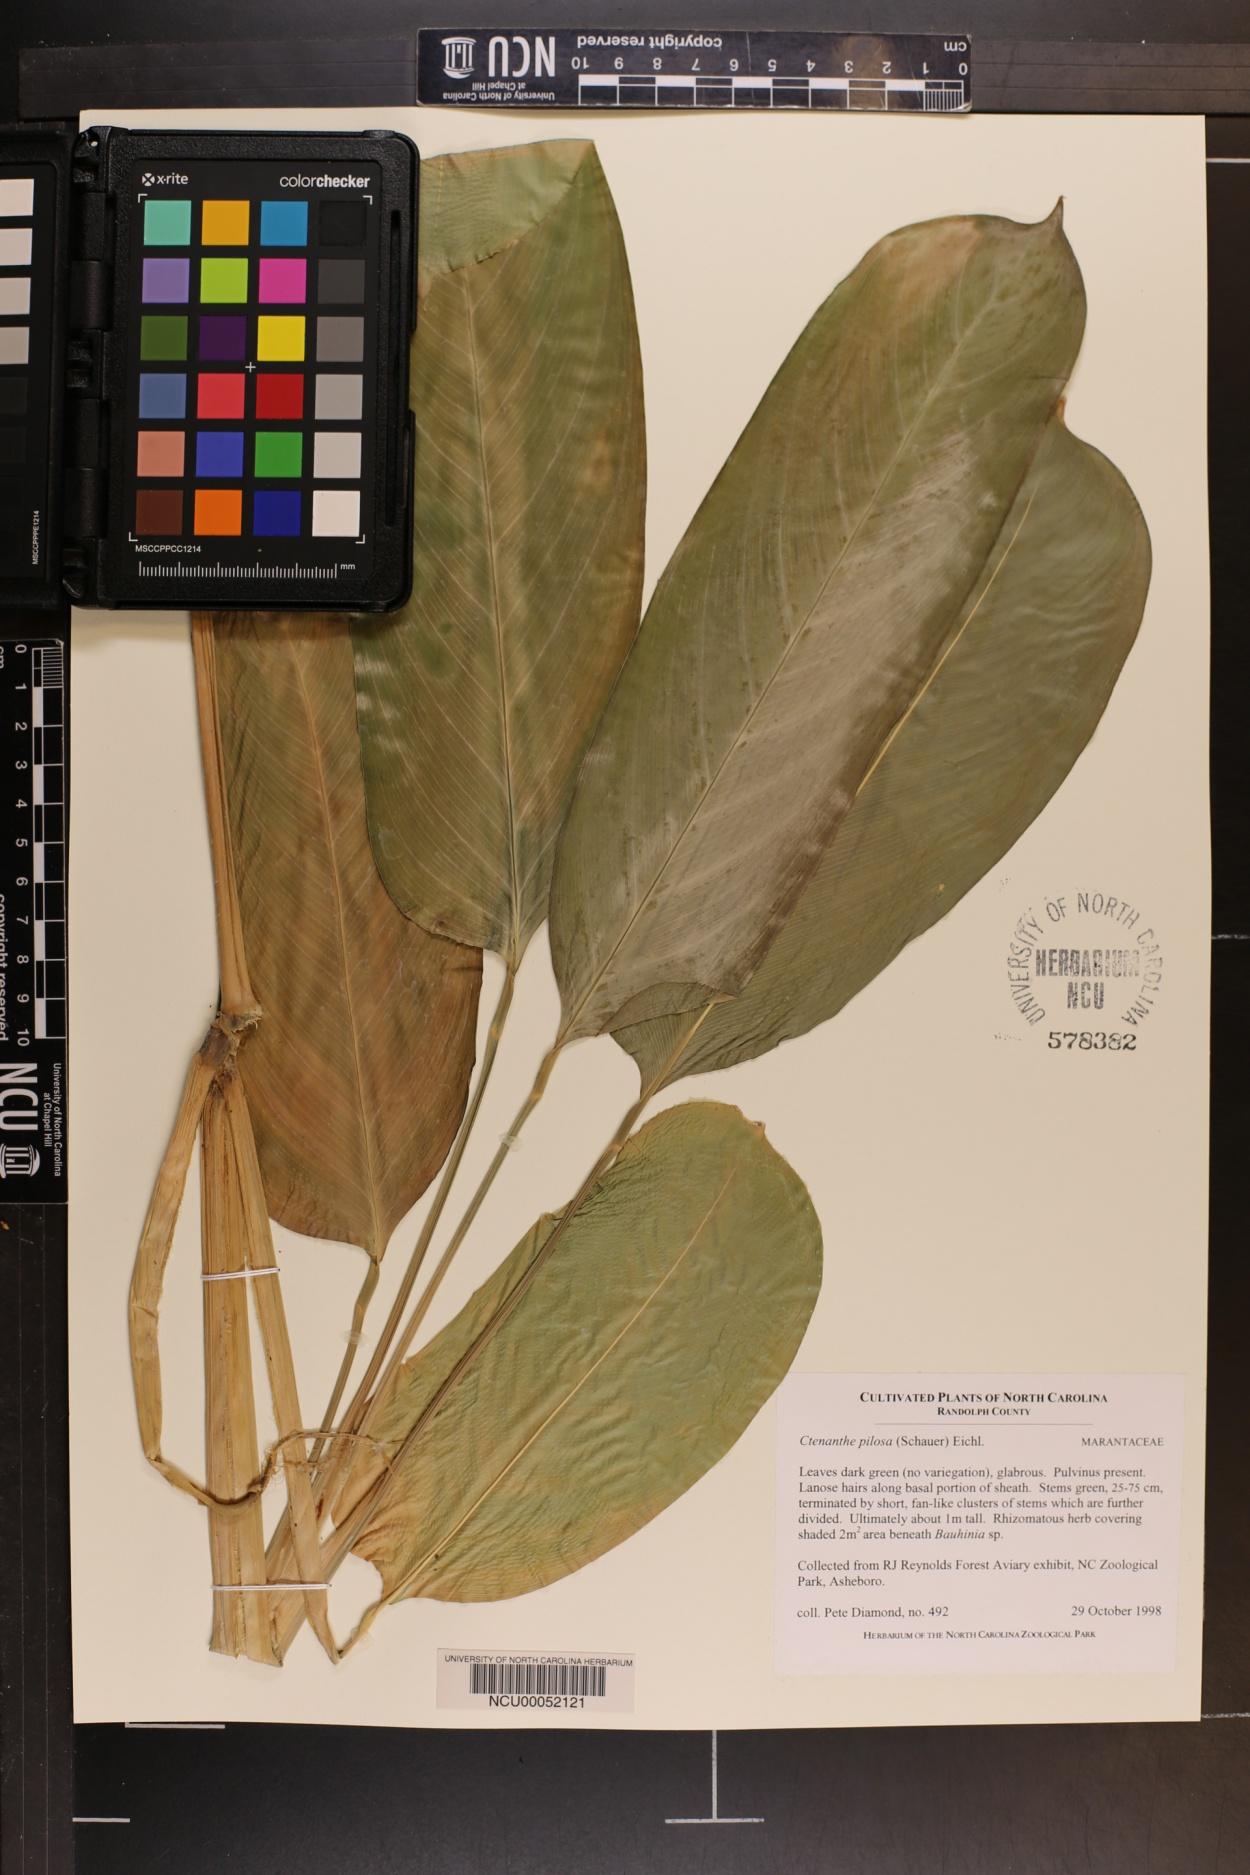 Ctenanthe marantifolia image